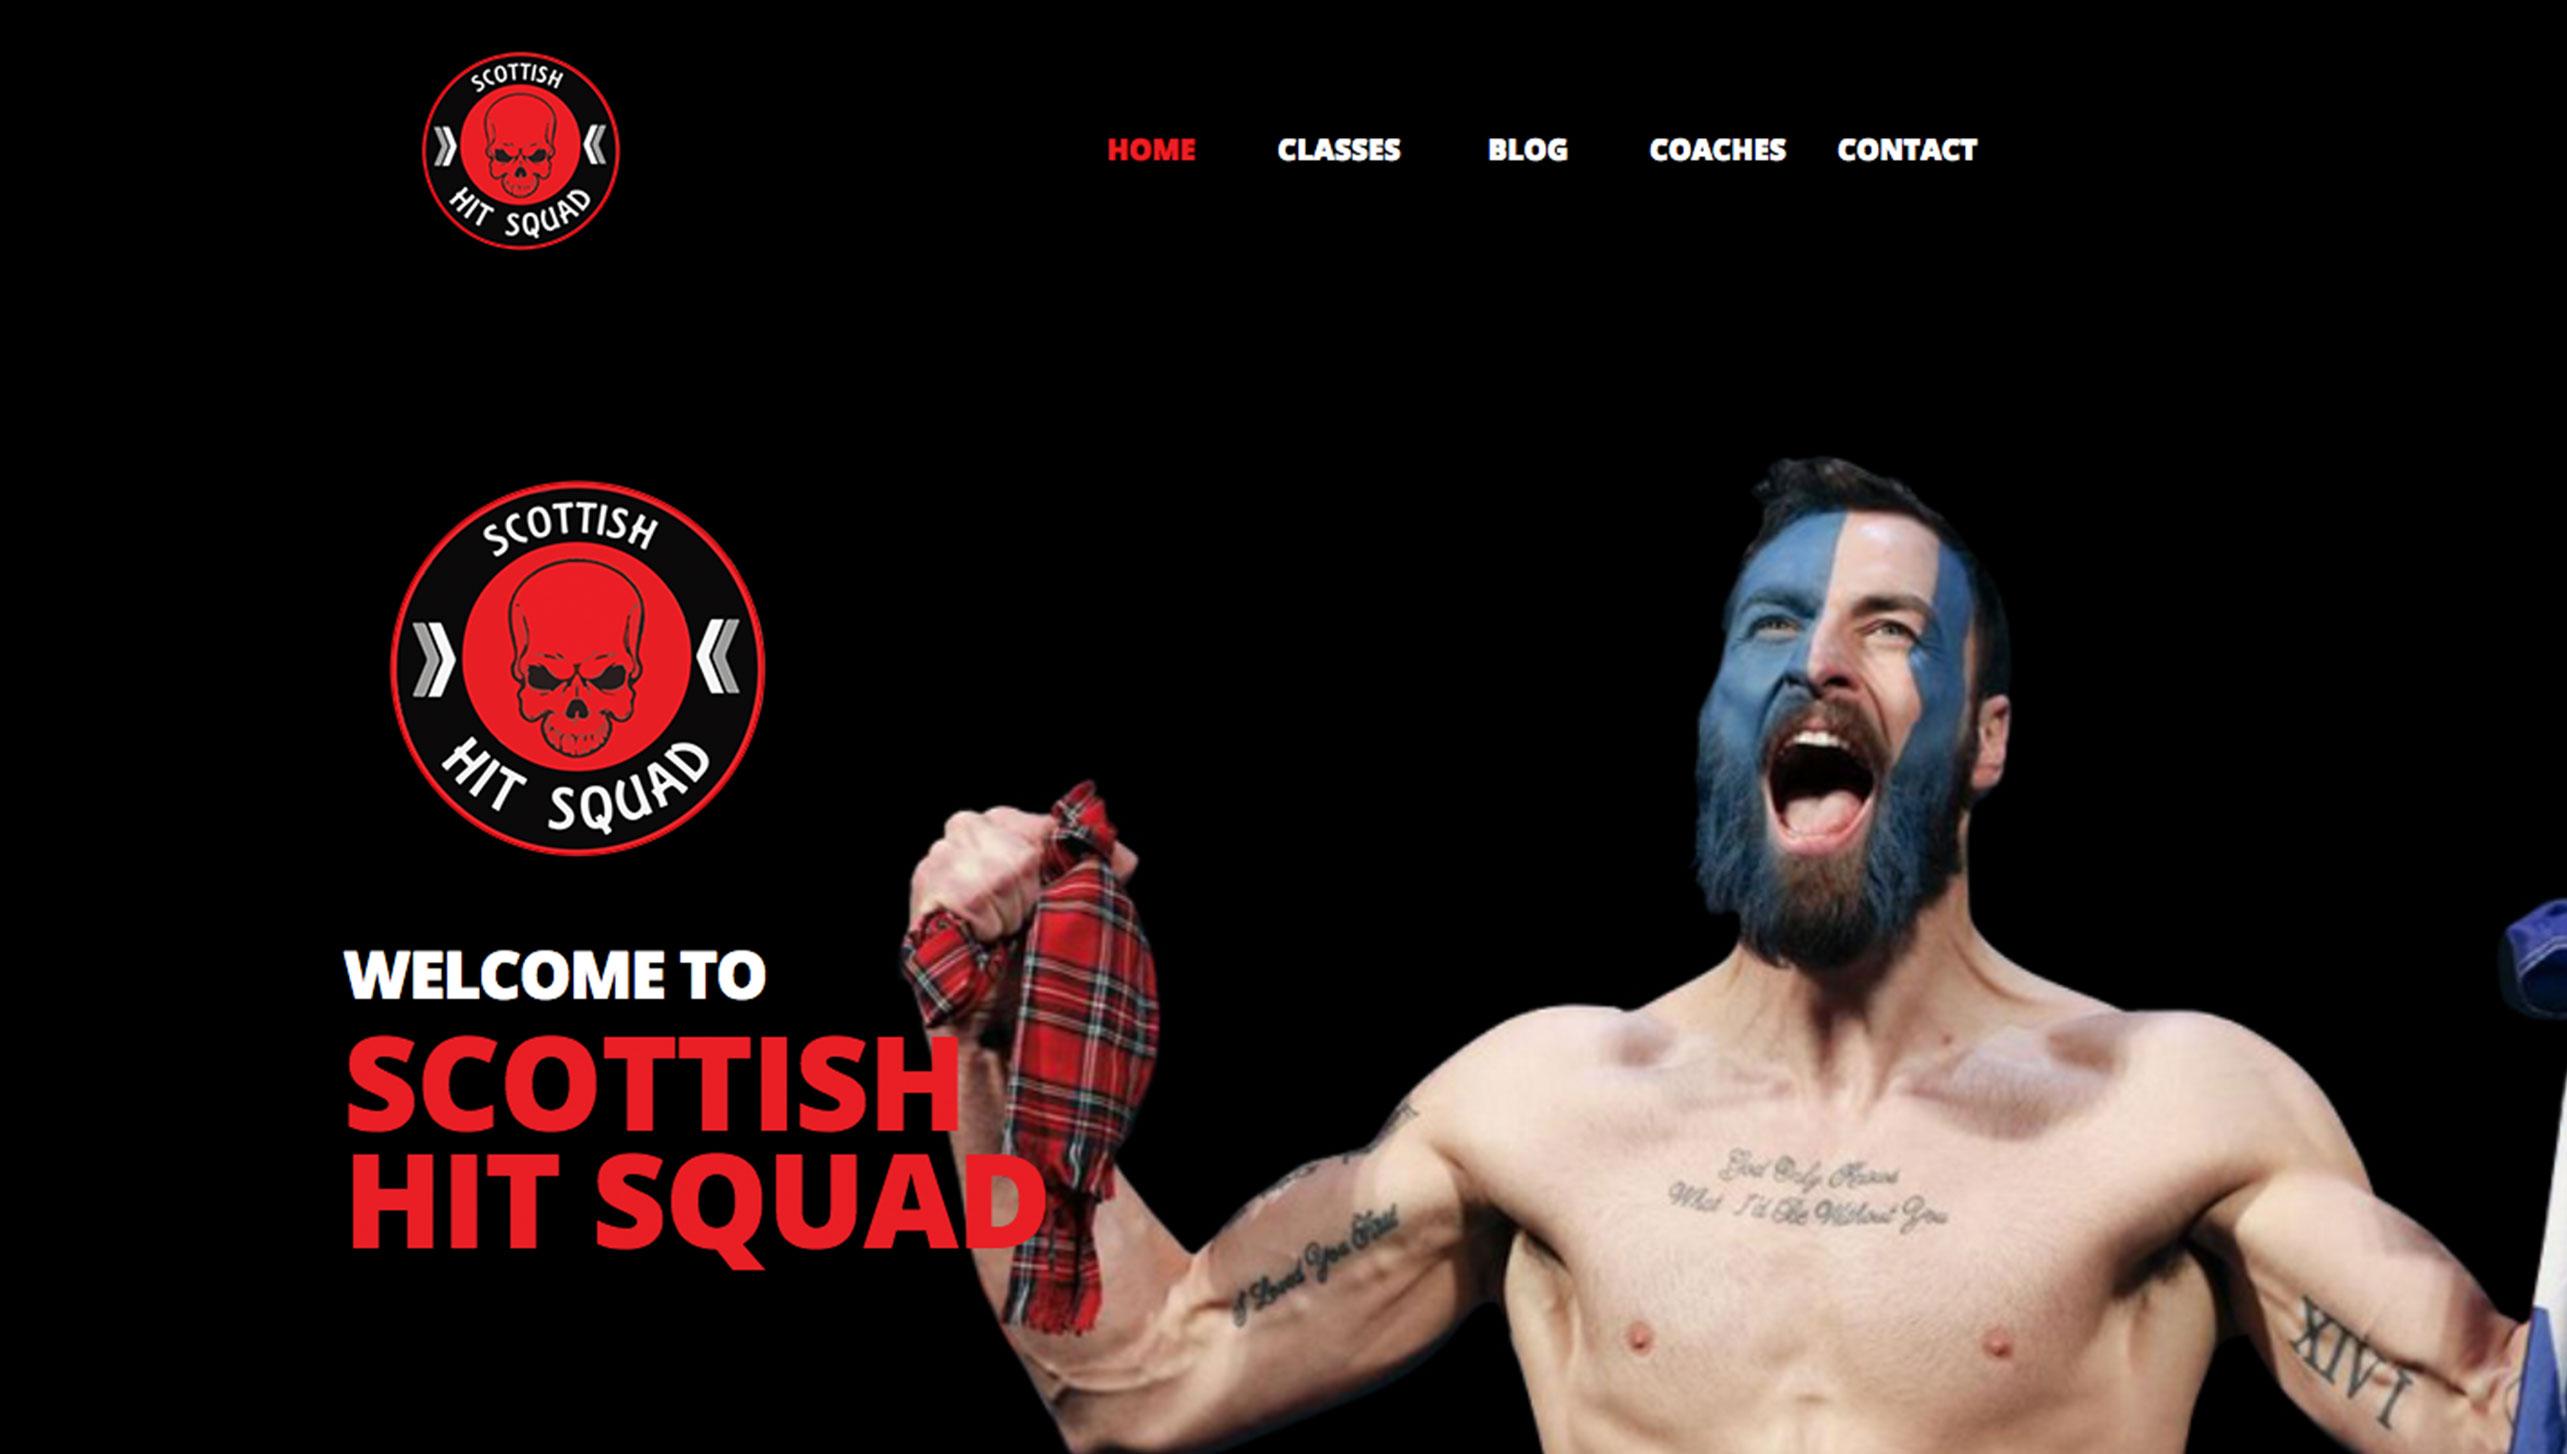 Scottish Hit Squad Website Image